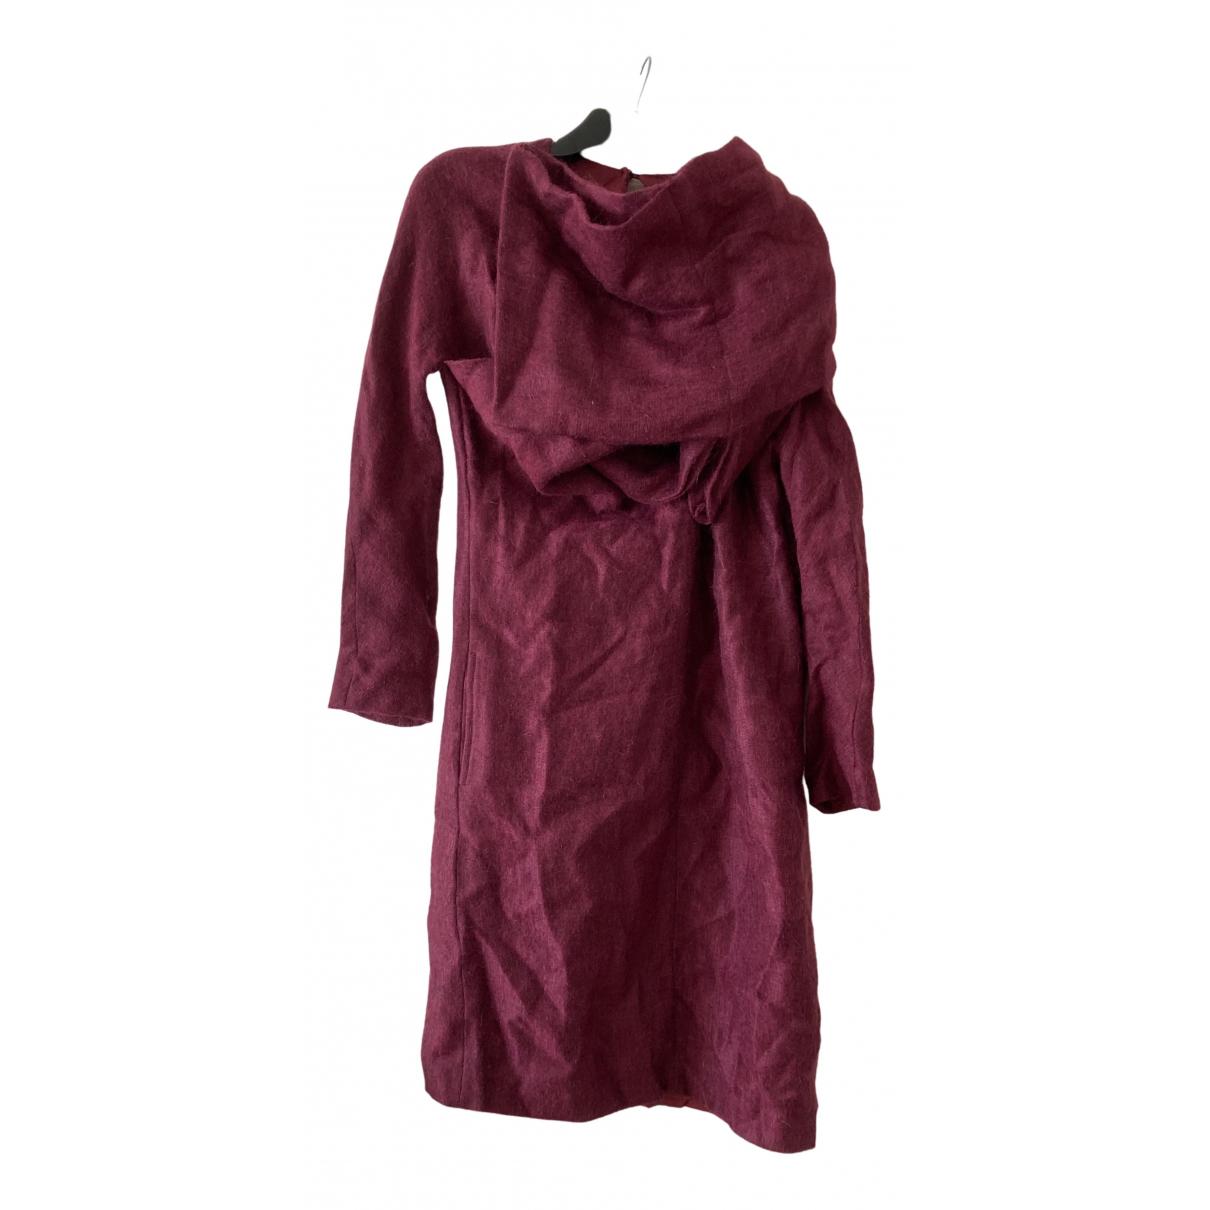 Nicole Farhi \N Burgundy Wool dress for Women 12 UK